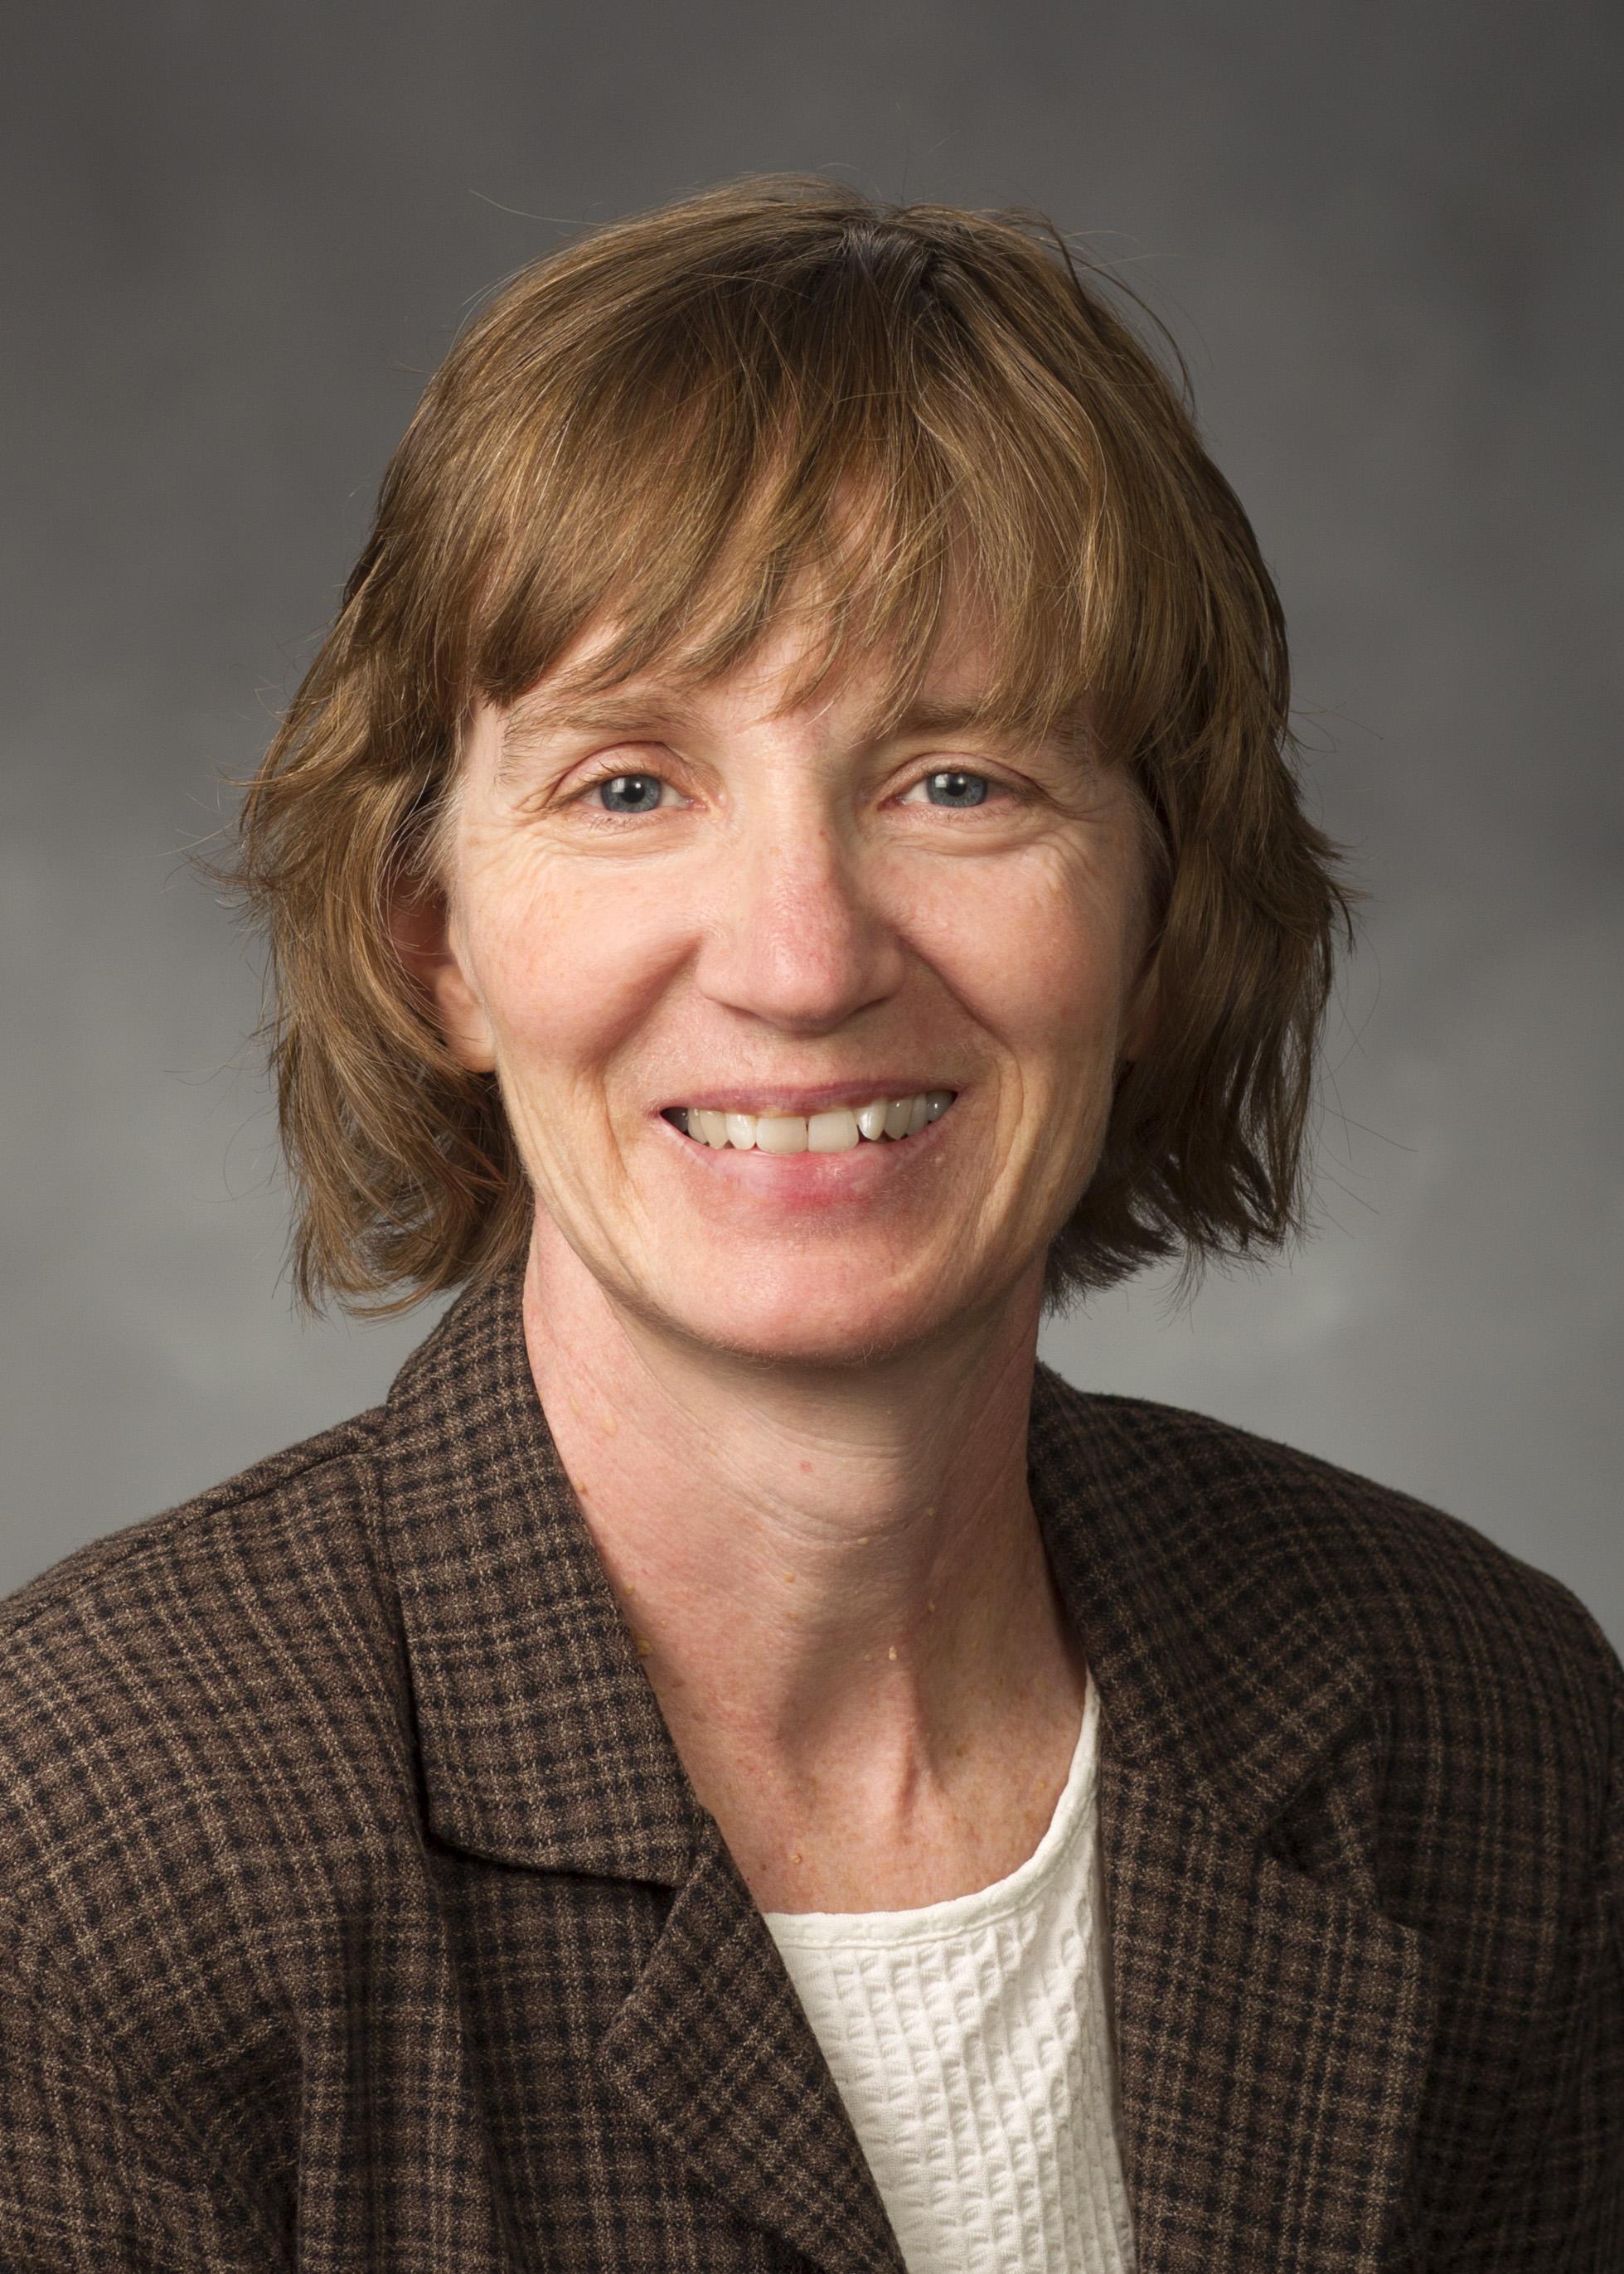 Jill Terry Rudy